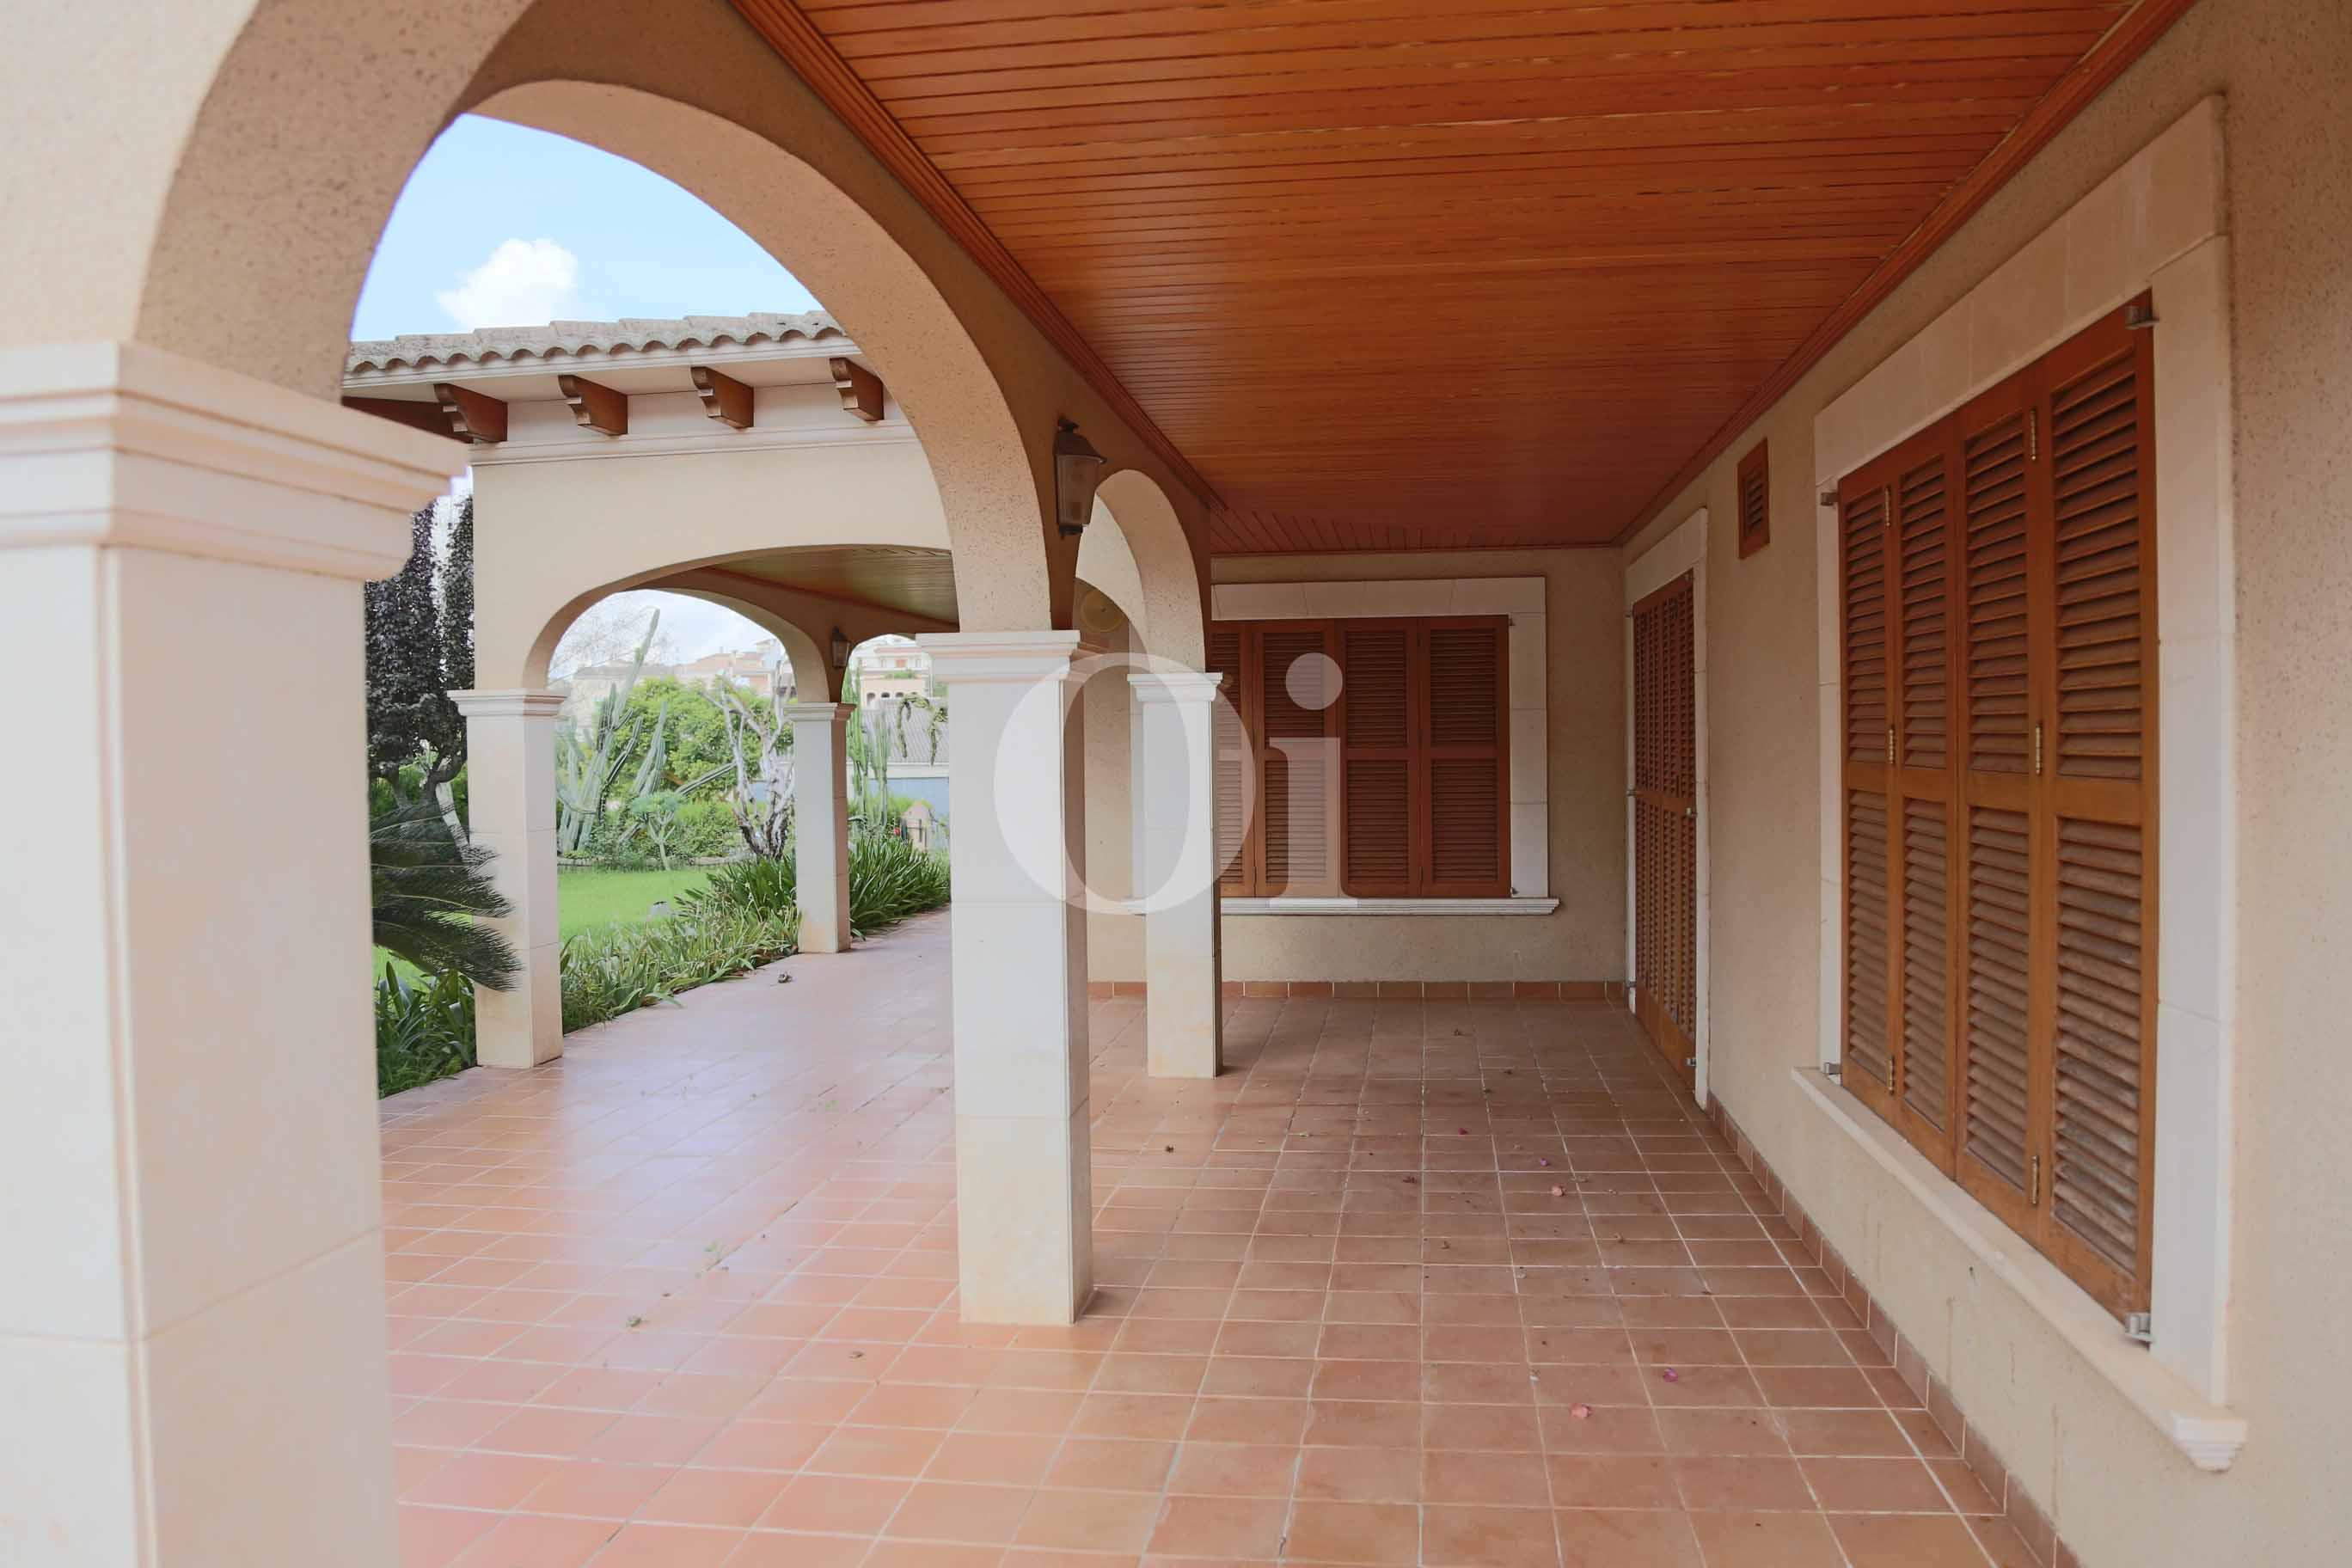 Veranda einer luxuriösen Villa zum Verkauf in San Lorenzo, Mallorca